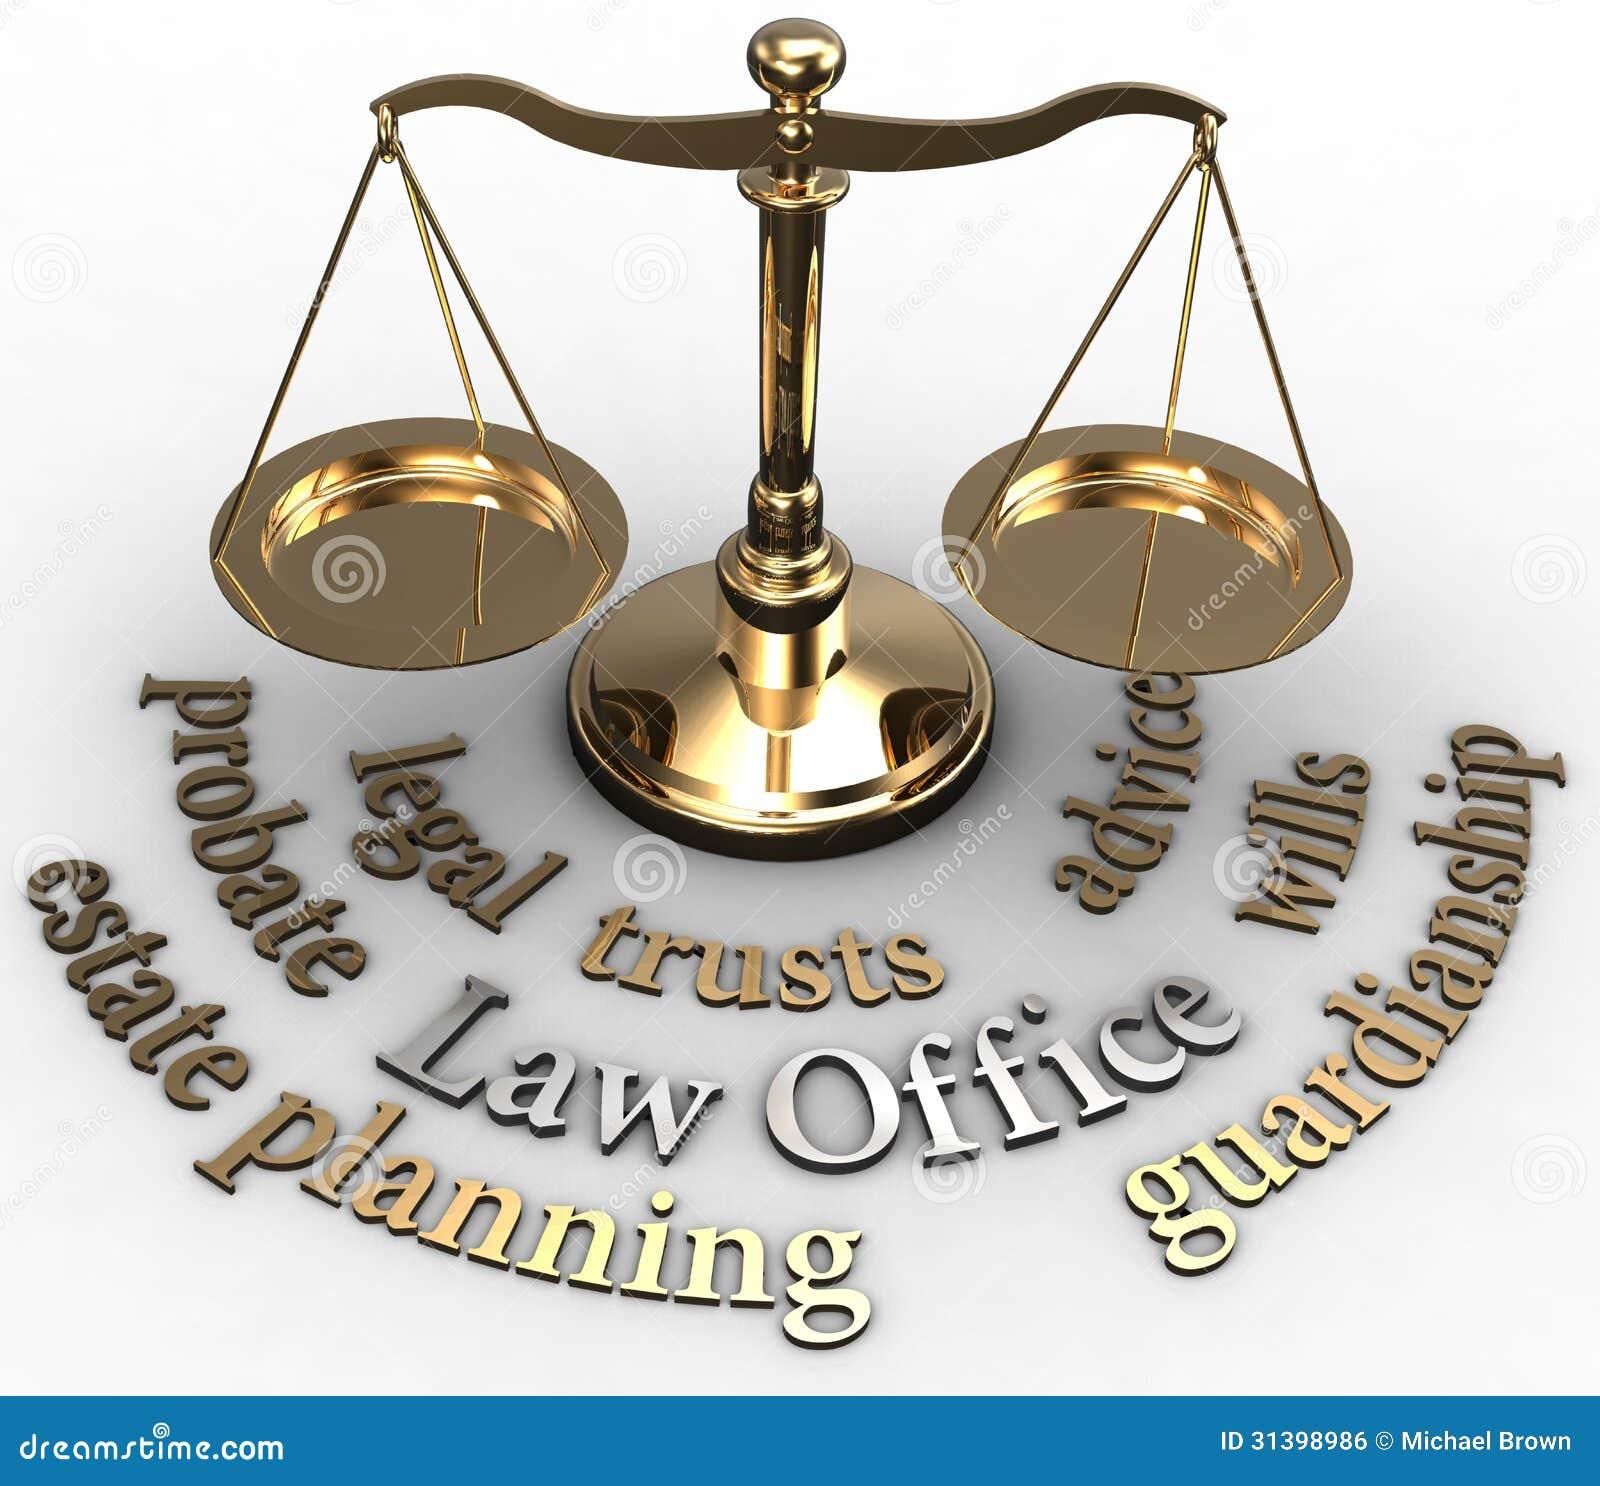 Estate Planning: Scale Estate Probate Wills Attorney Words Stock